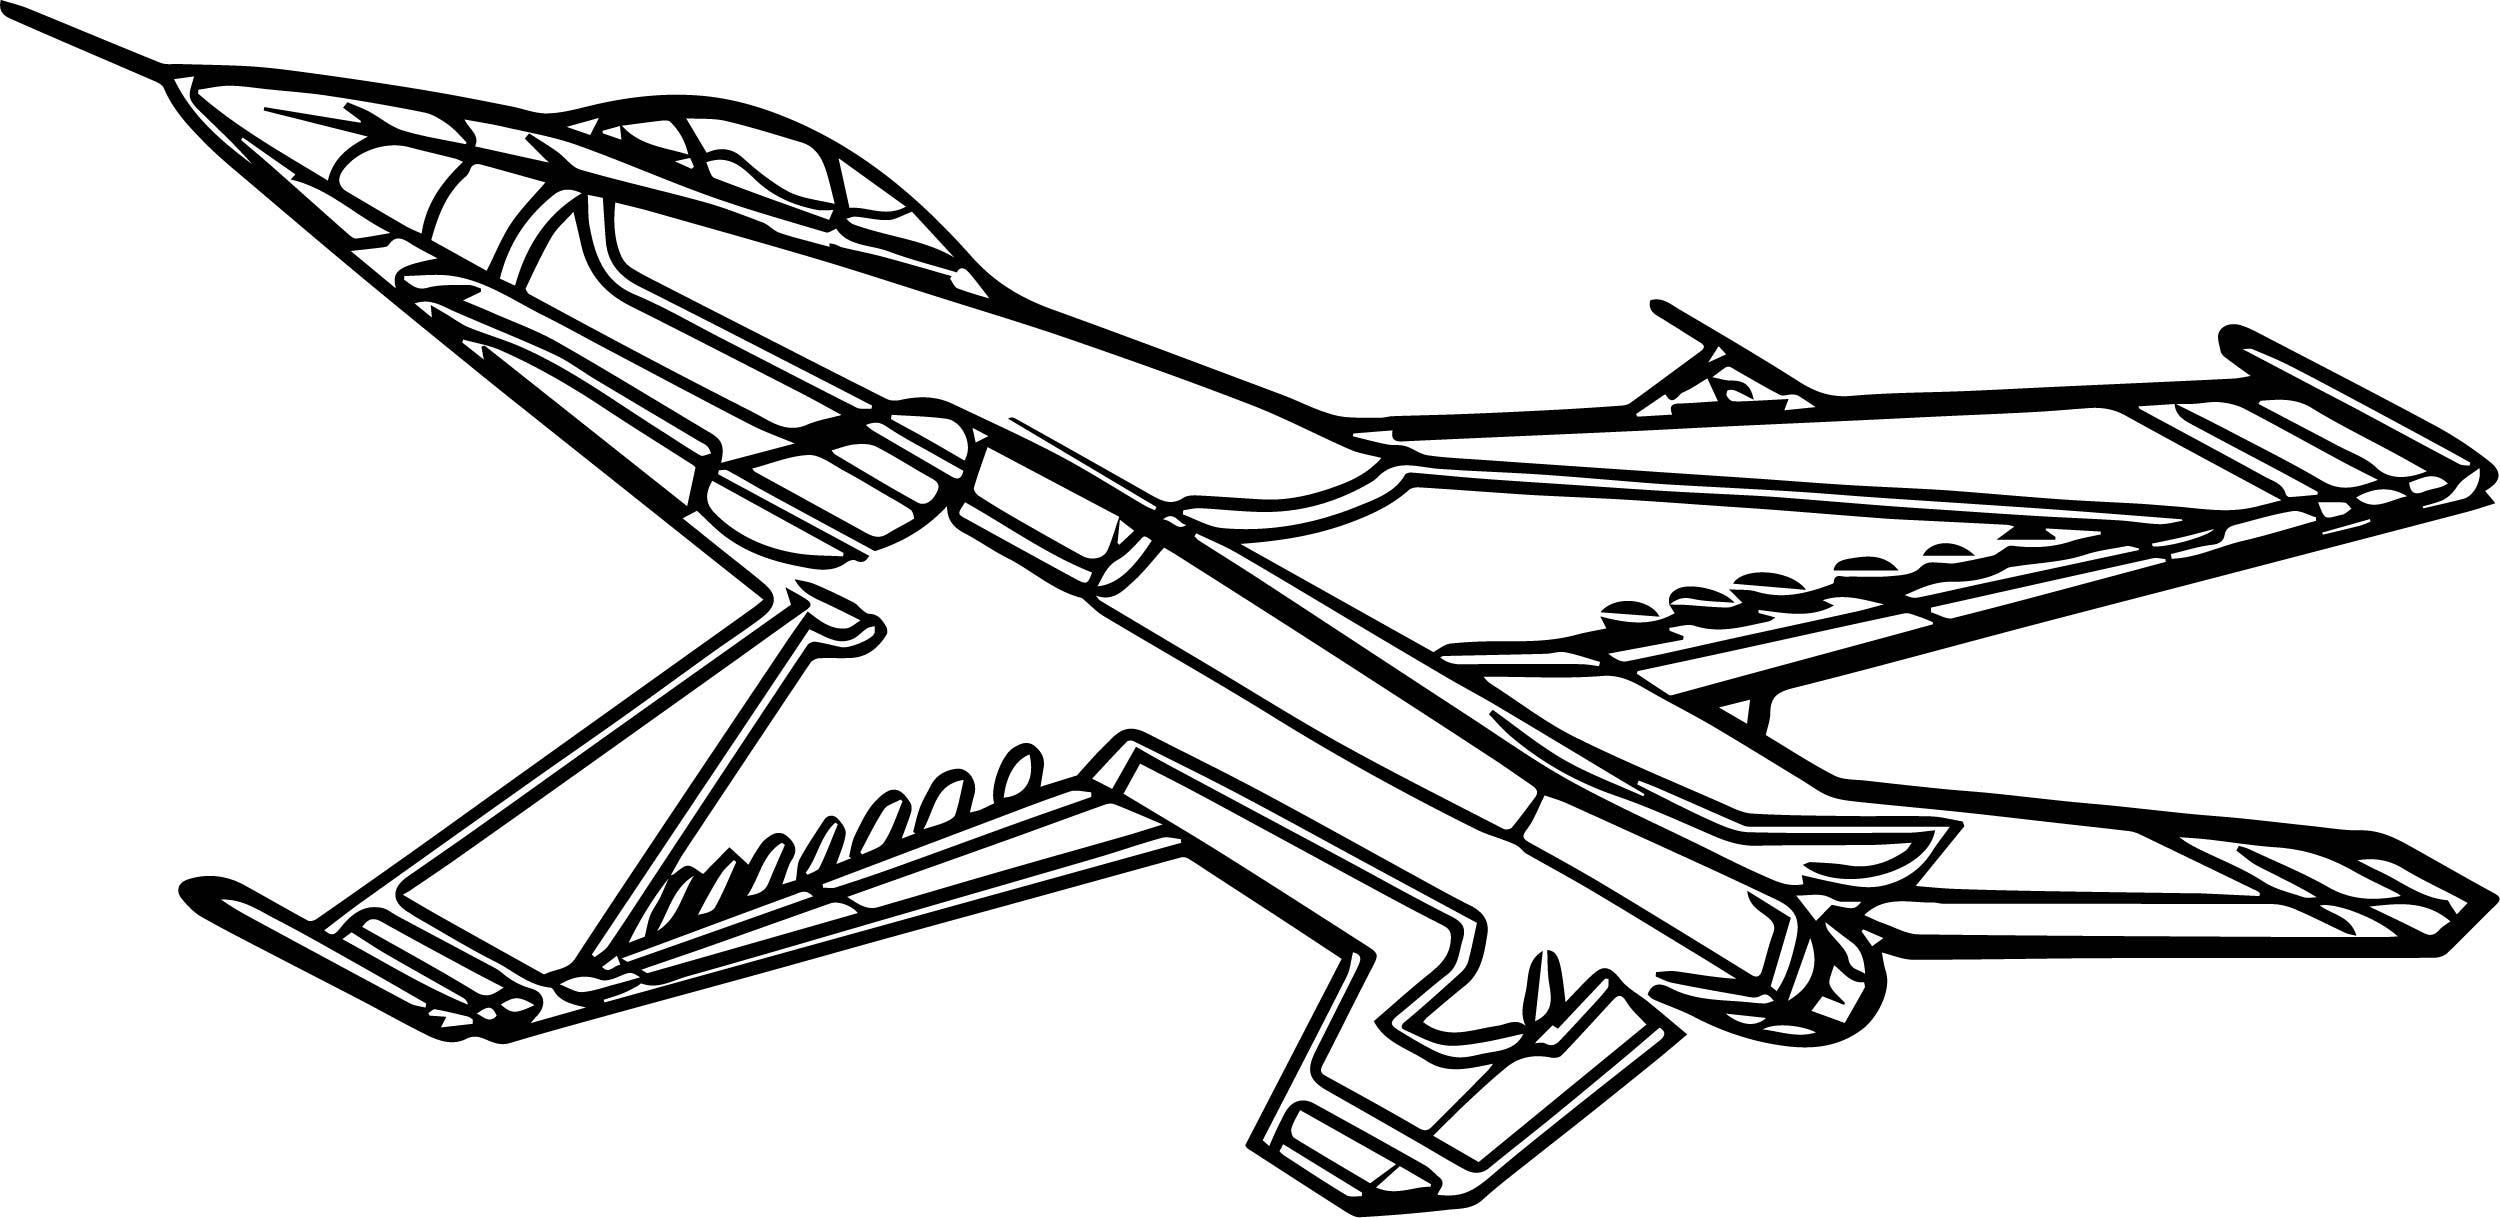 Airplane Outline Drawing At Getdrawings